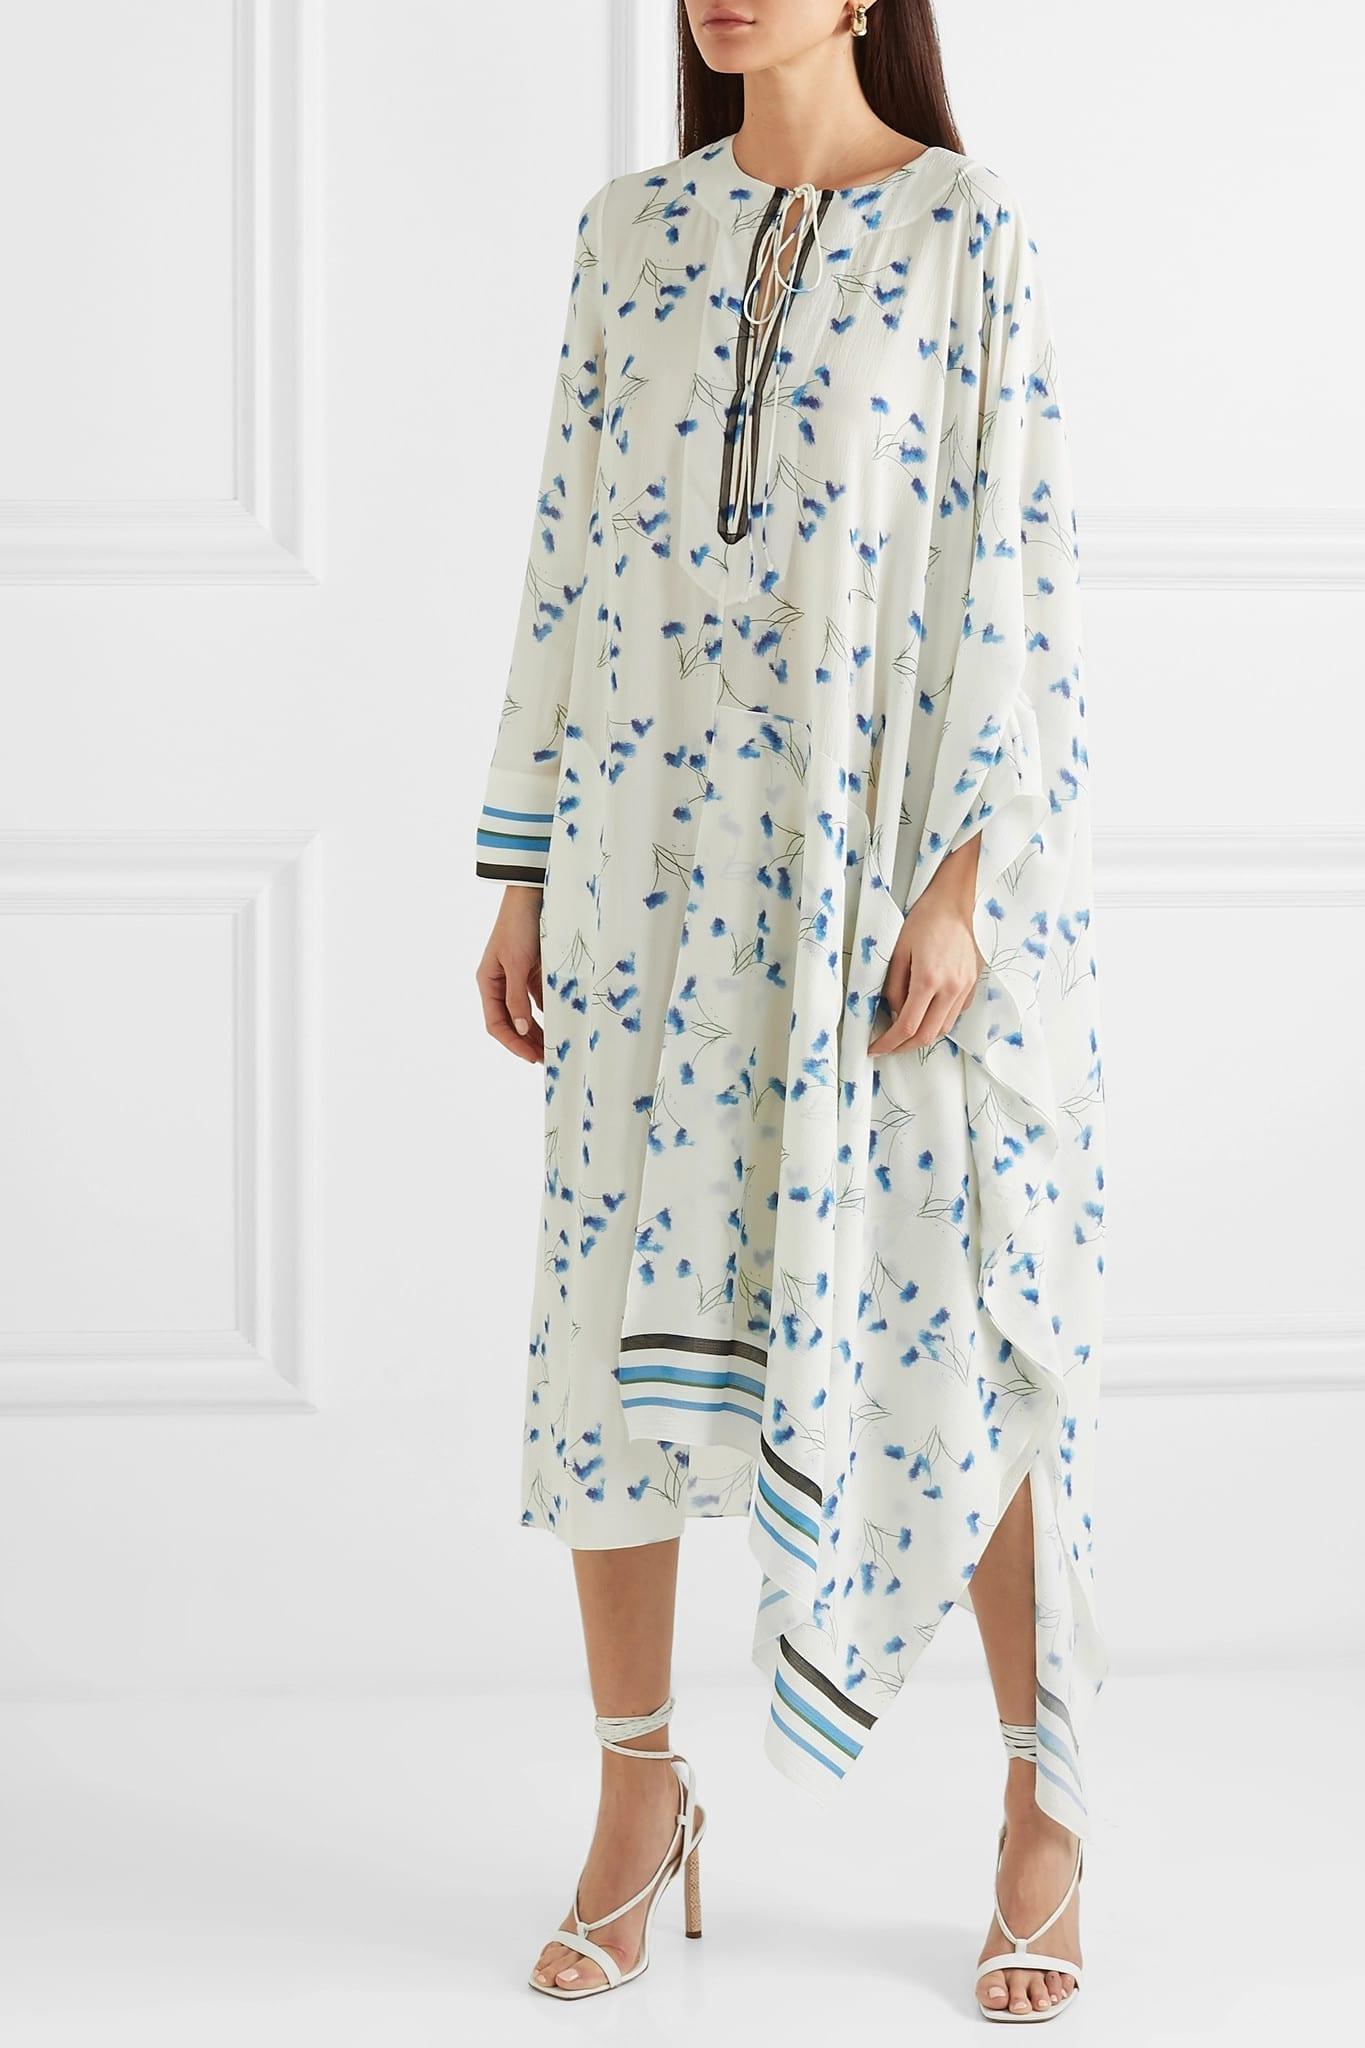 7580a2611f ROLAND MOURET Damon Mesh-Trimmed Printed Crepe White Dress - We ...